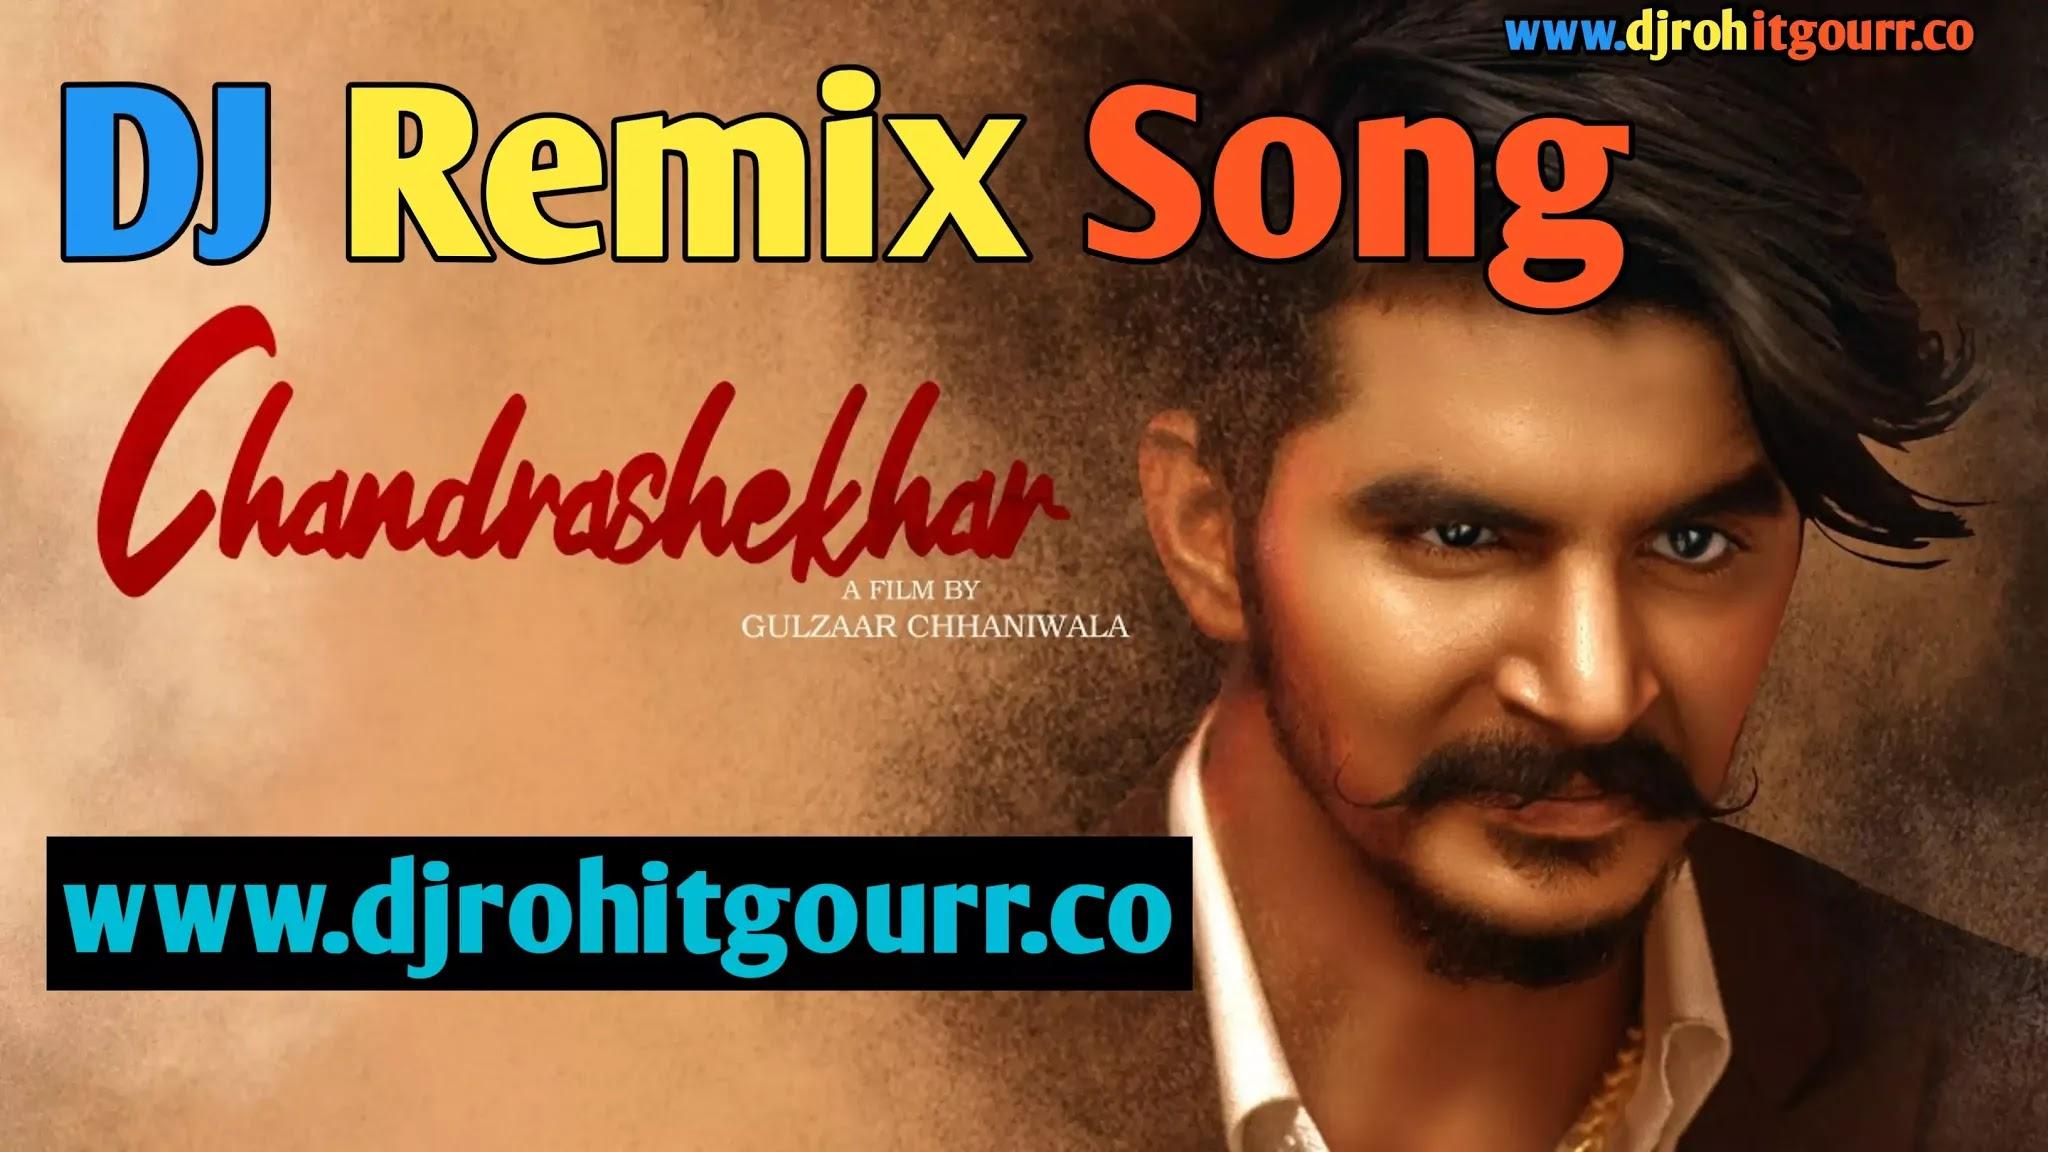 CHANDRASHEKHAR DJ REMIX SONG -GULZAAR CHHANIWALA